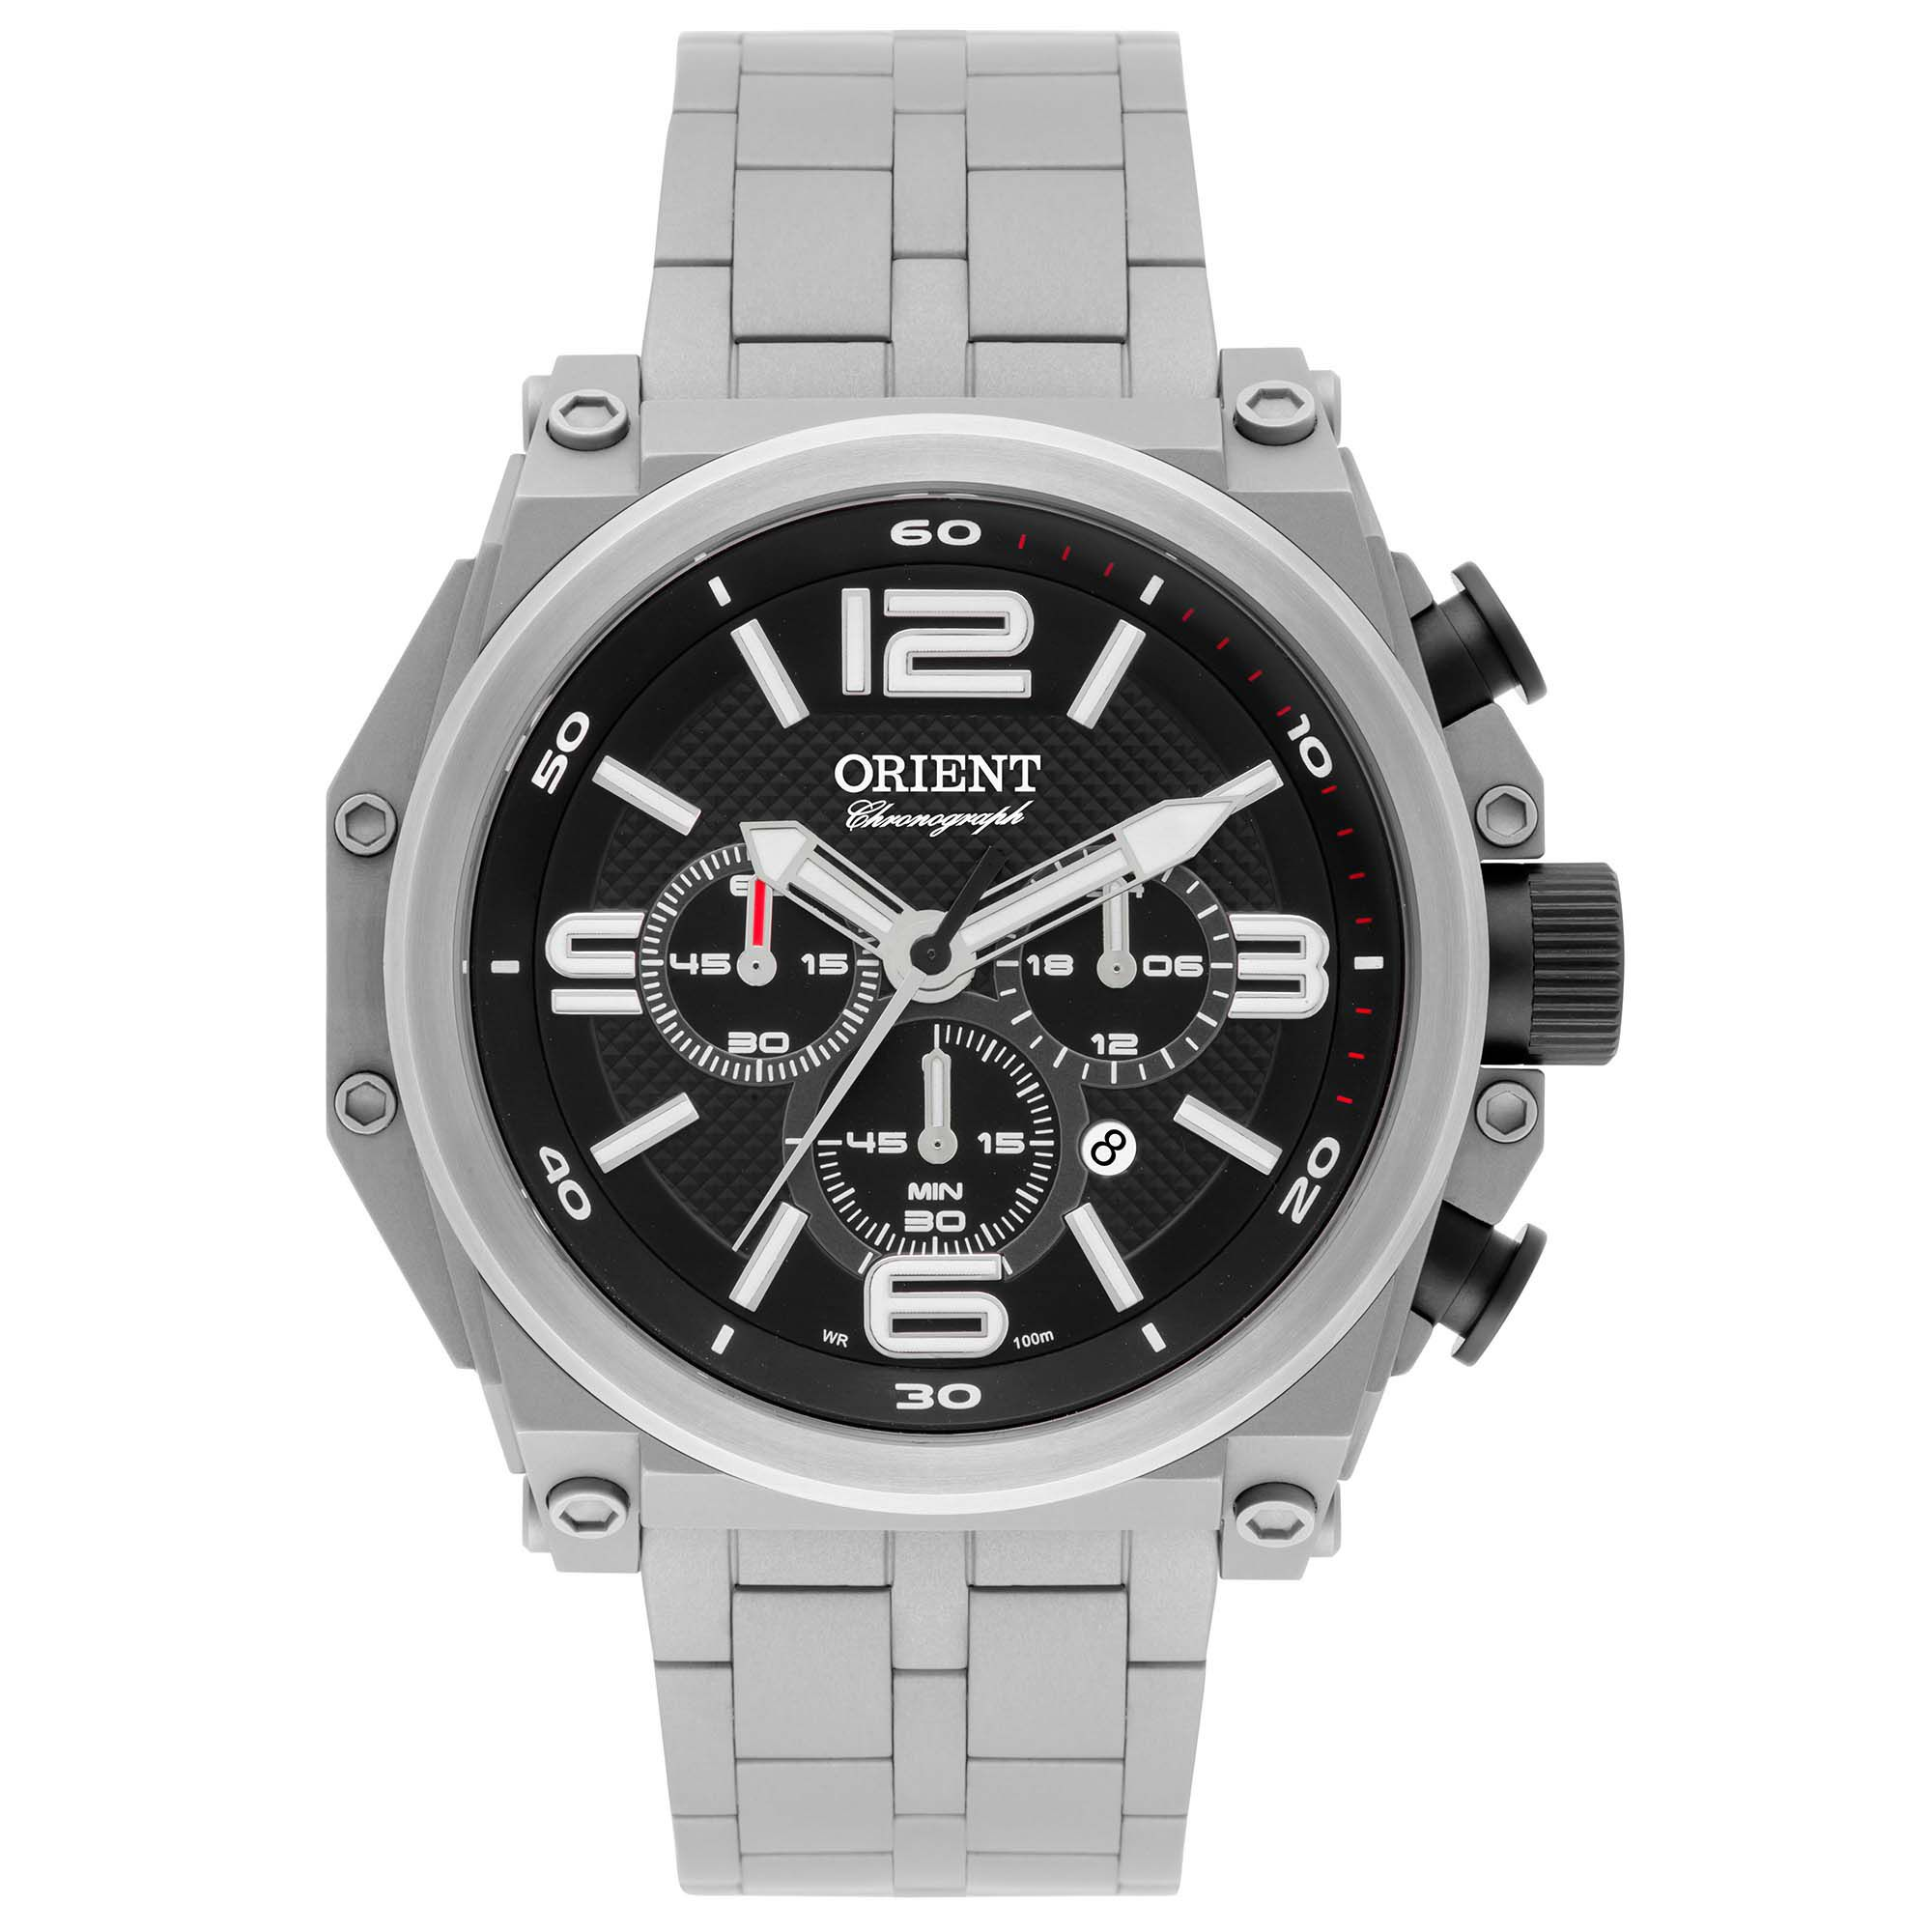 Relógio Masculino Orient MBTTC013 P2GX